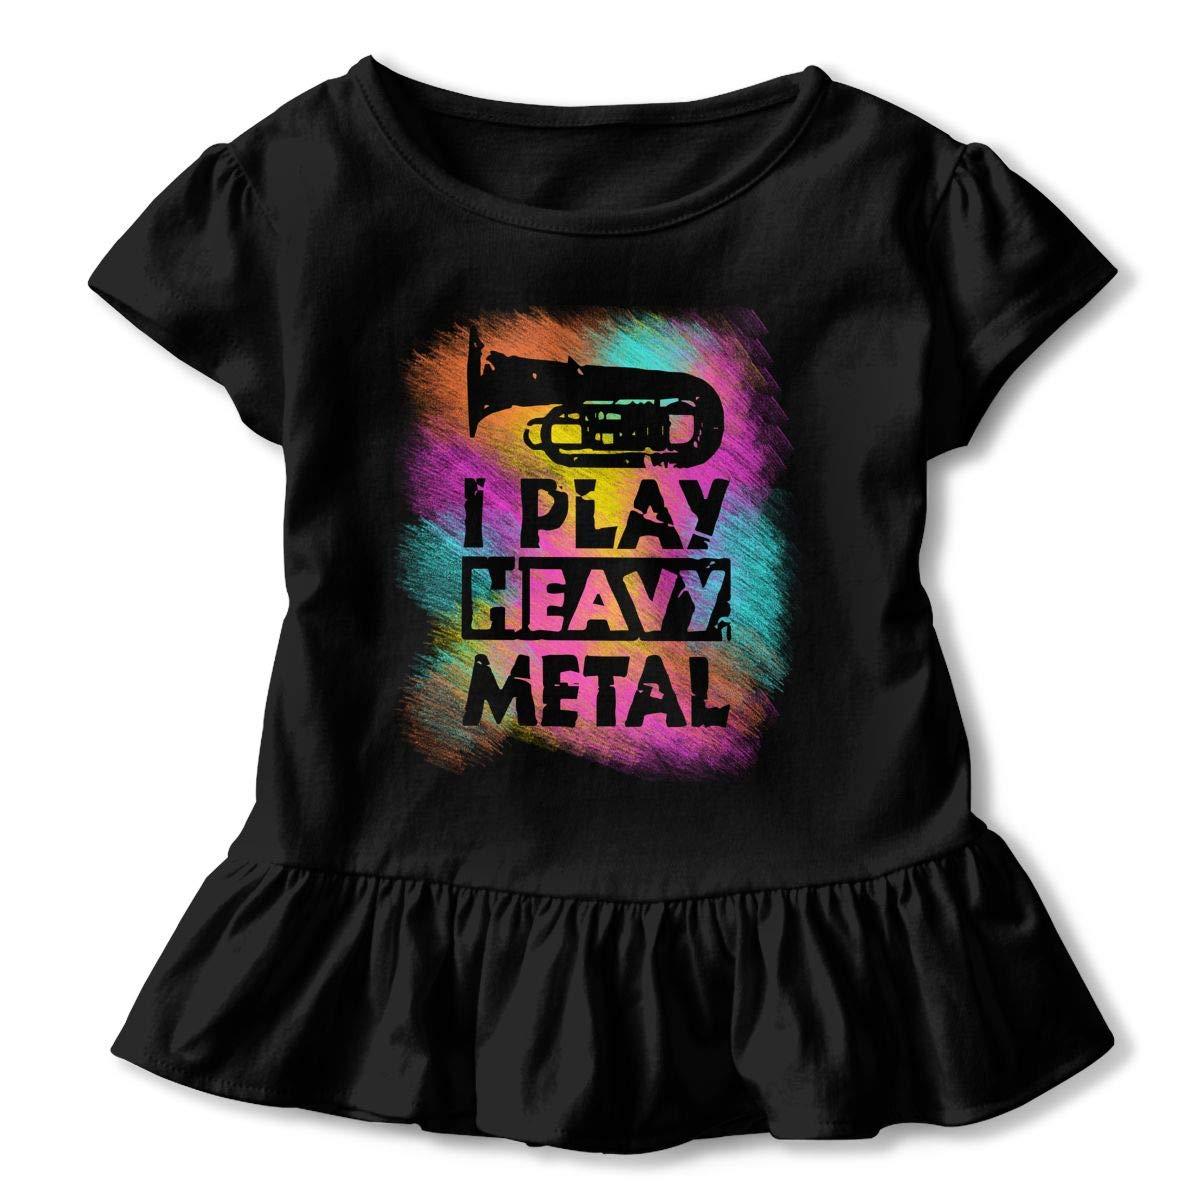 I Play Funny Heavy Metal Toddler Girls T Shirt Kids Cotton Short Sleeve Ruffle Tee